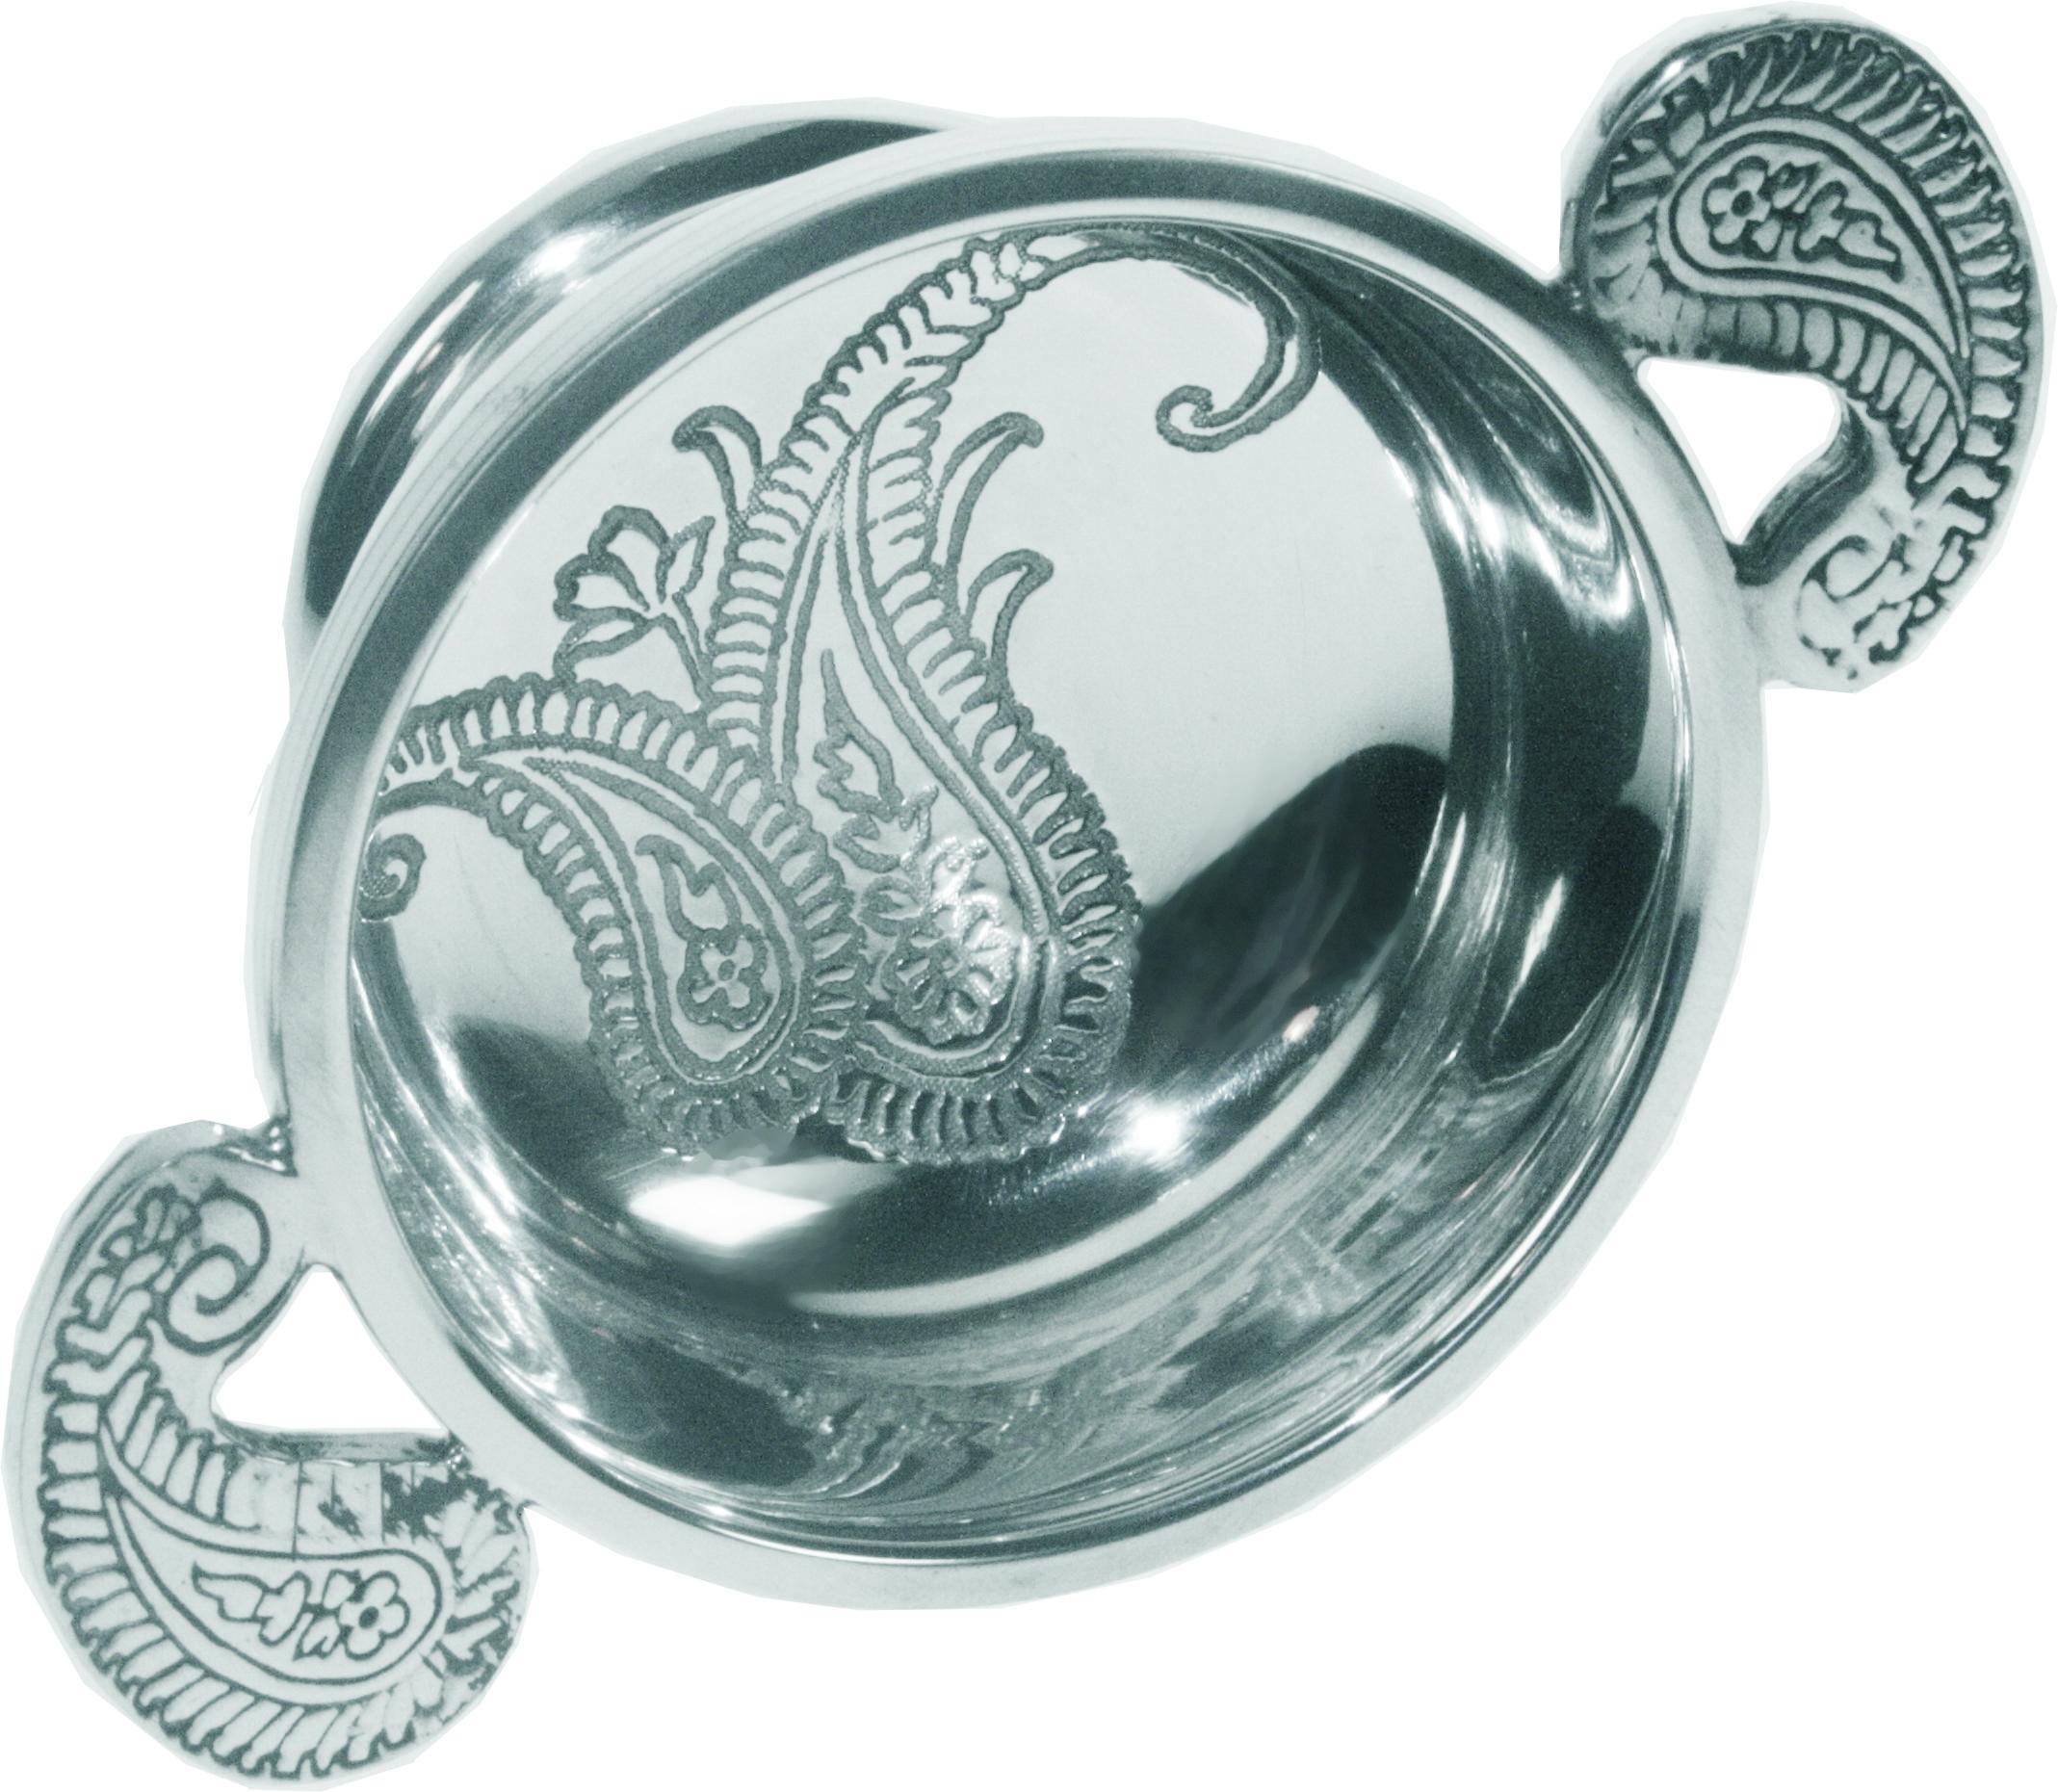 "Spun Pewter Quaich Bowl with a Paisley Design 7cm (2.75"")"